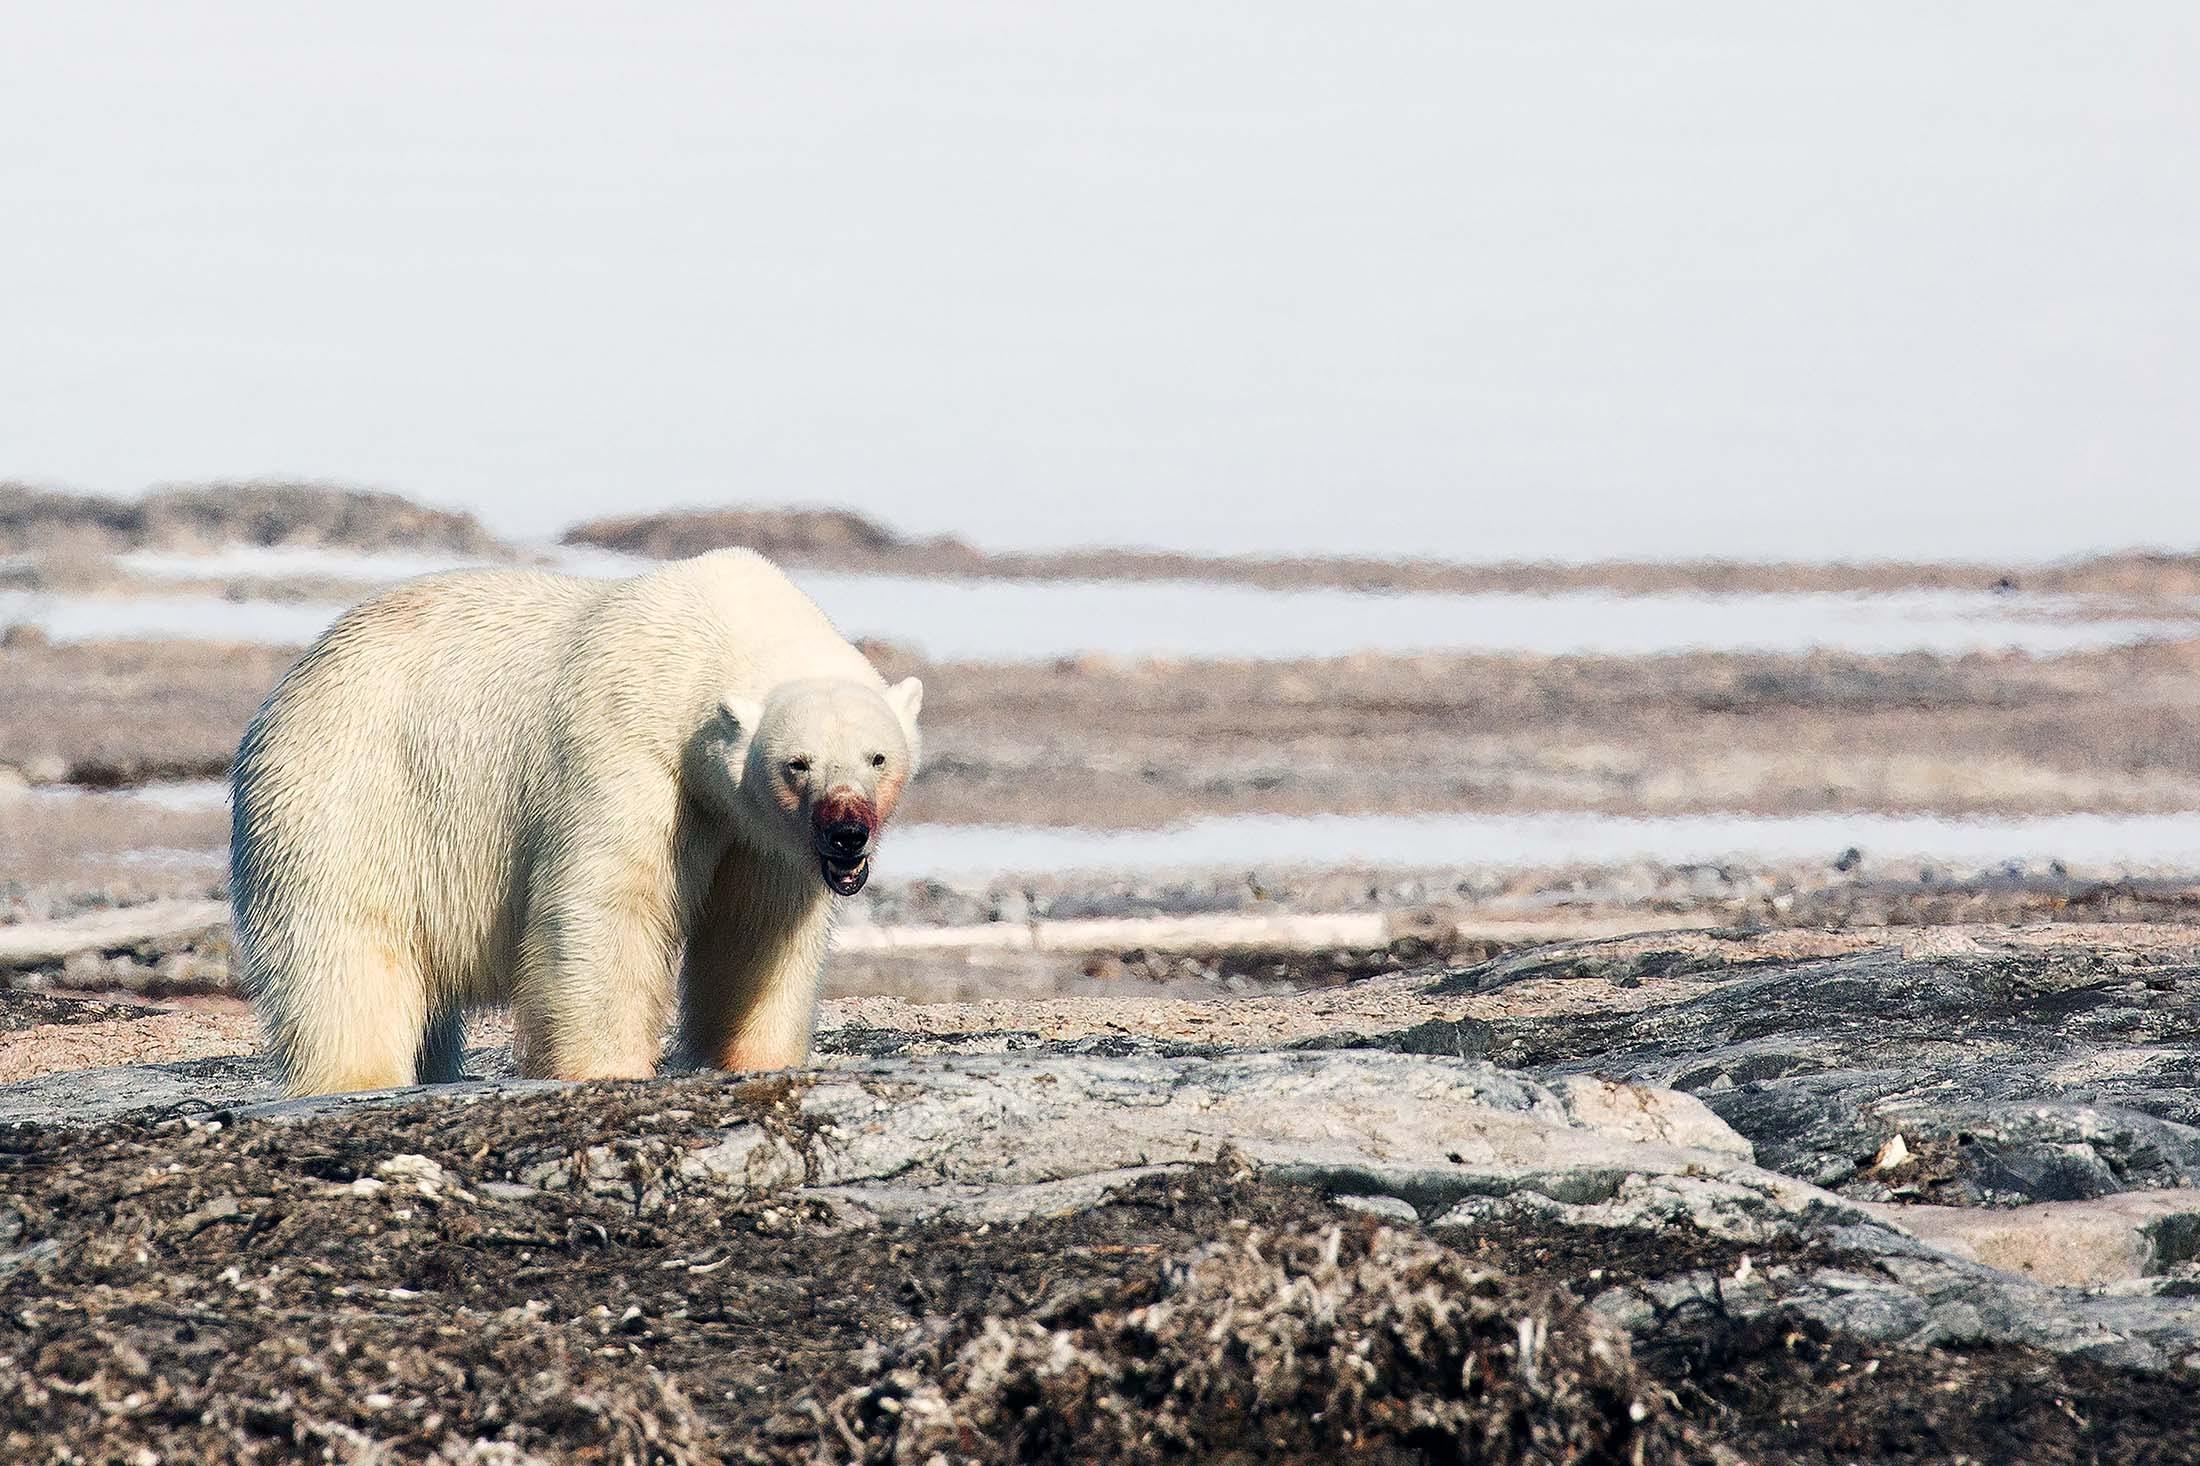 Polar bears in Spitsbergen, Svalbard